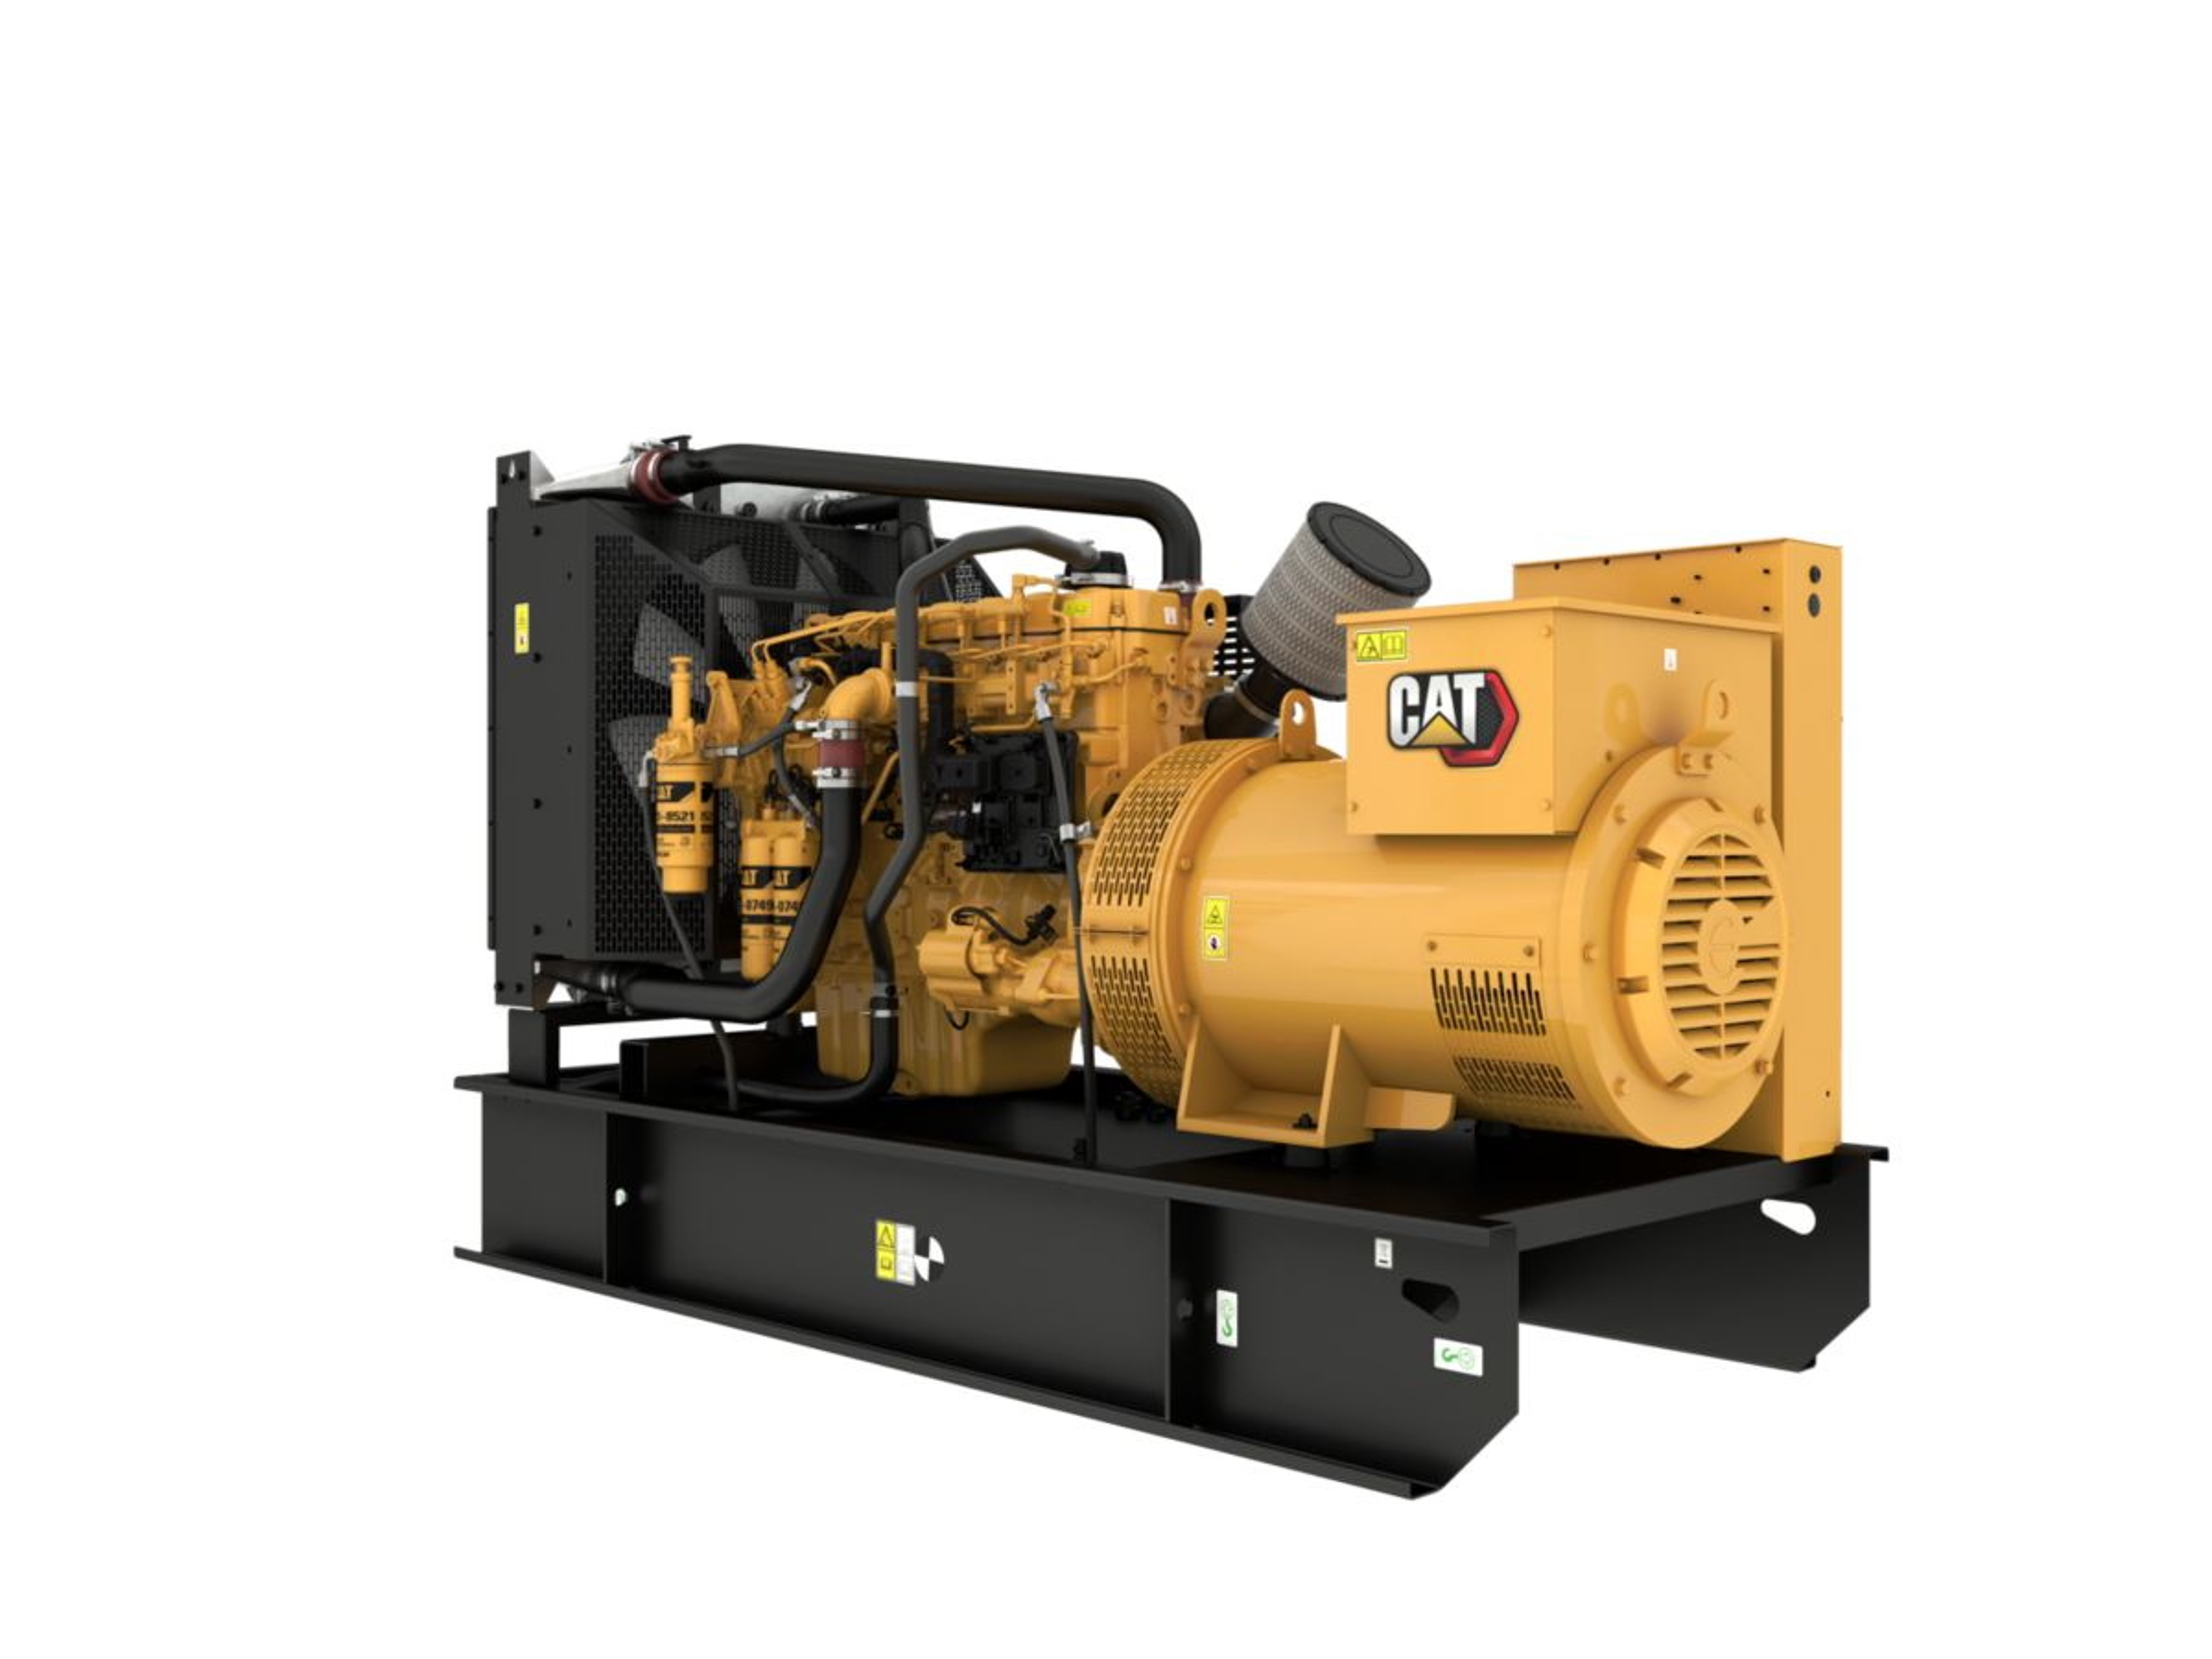 DE400 GC Diesel Generator Rear Left>